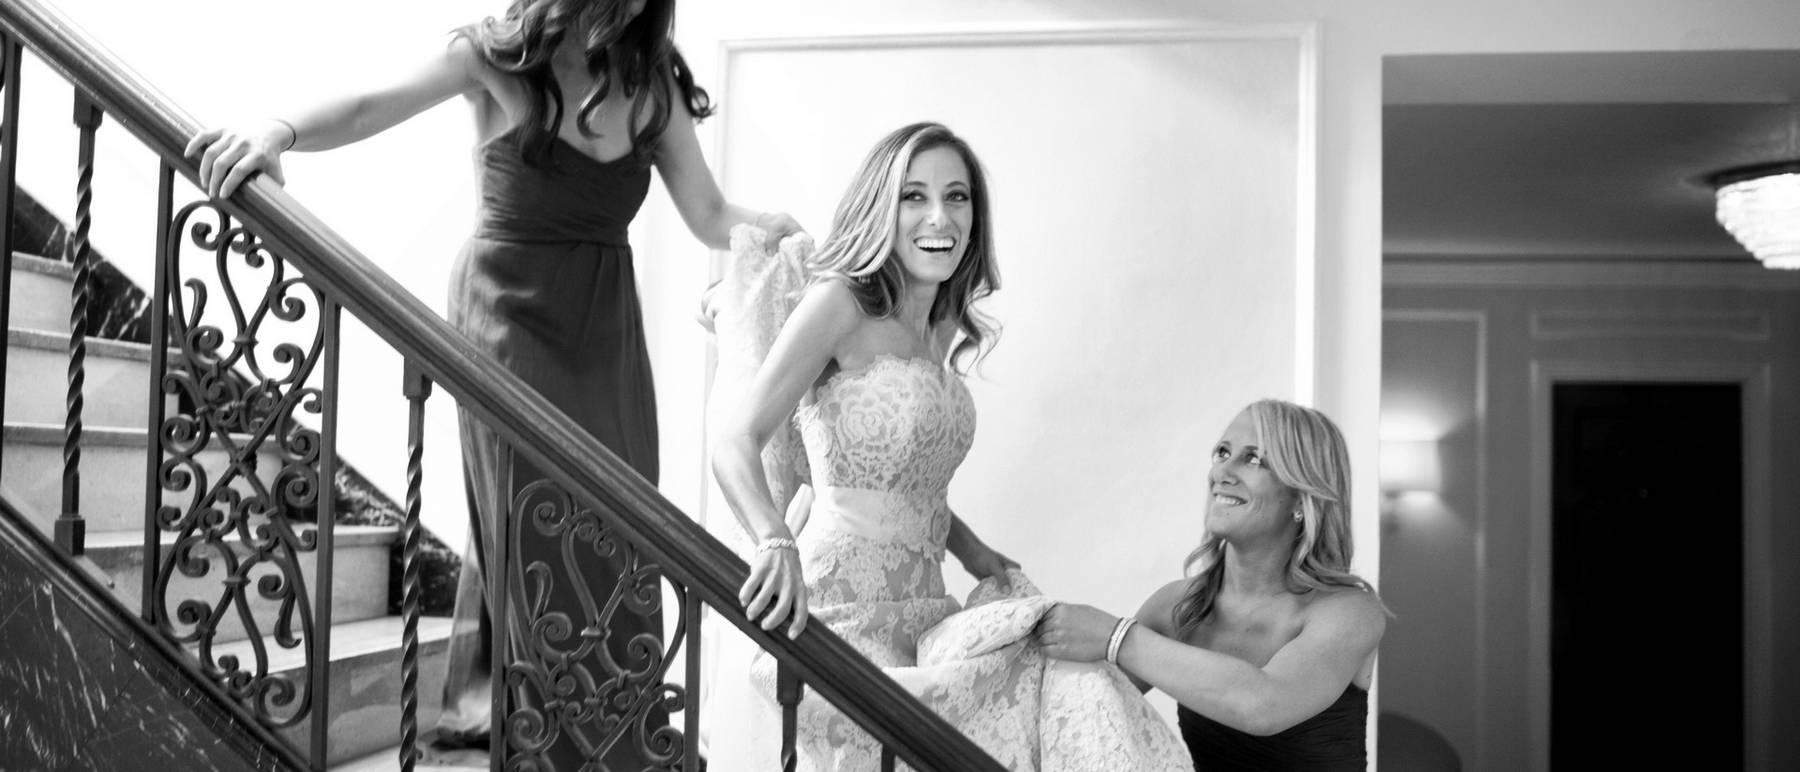 johnandjoseph-wedding-photographer-hz-slider-302